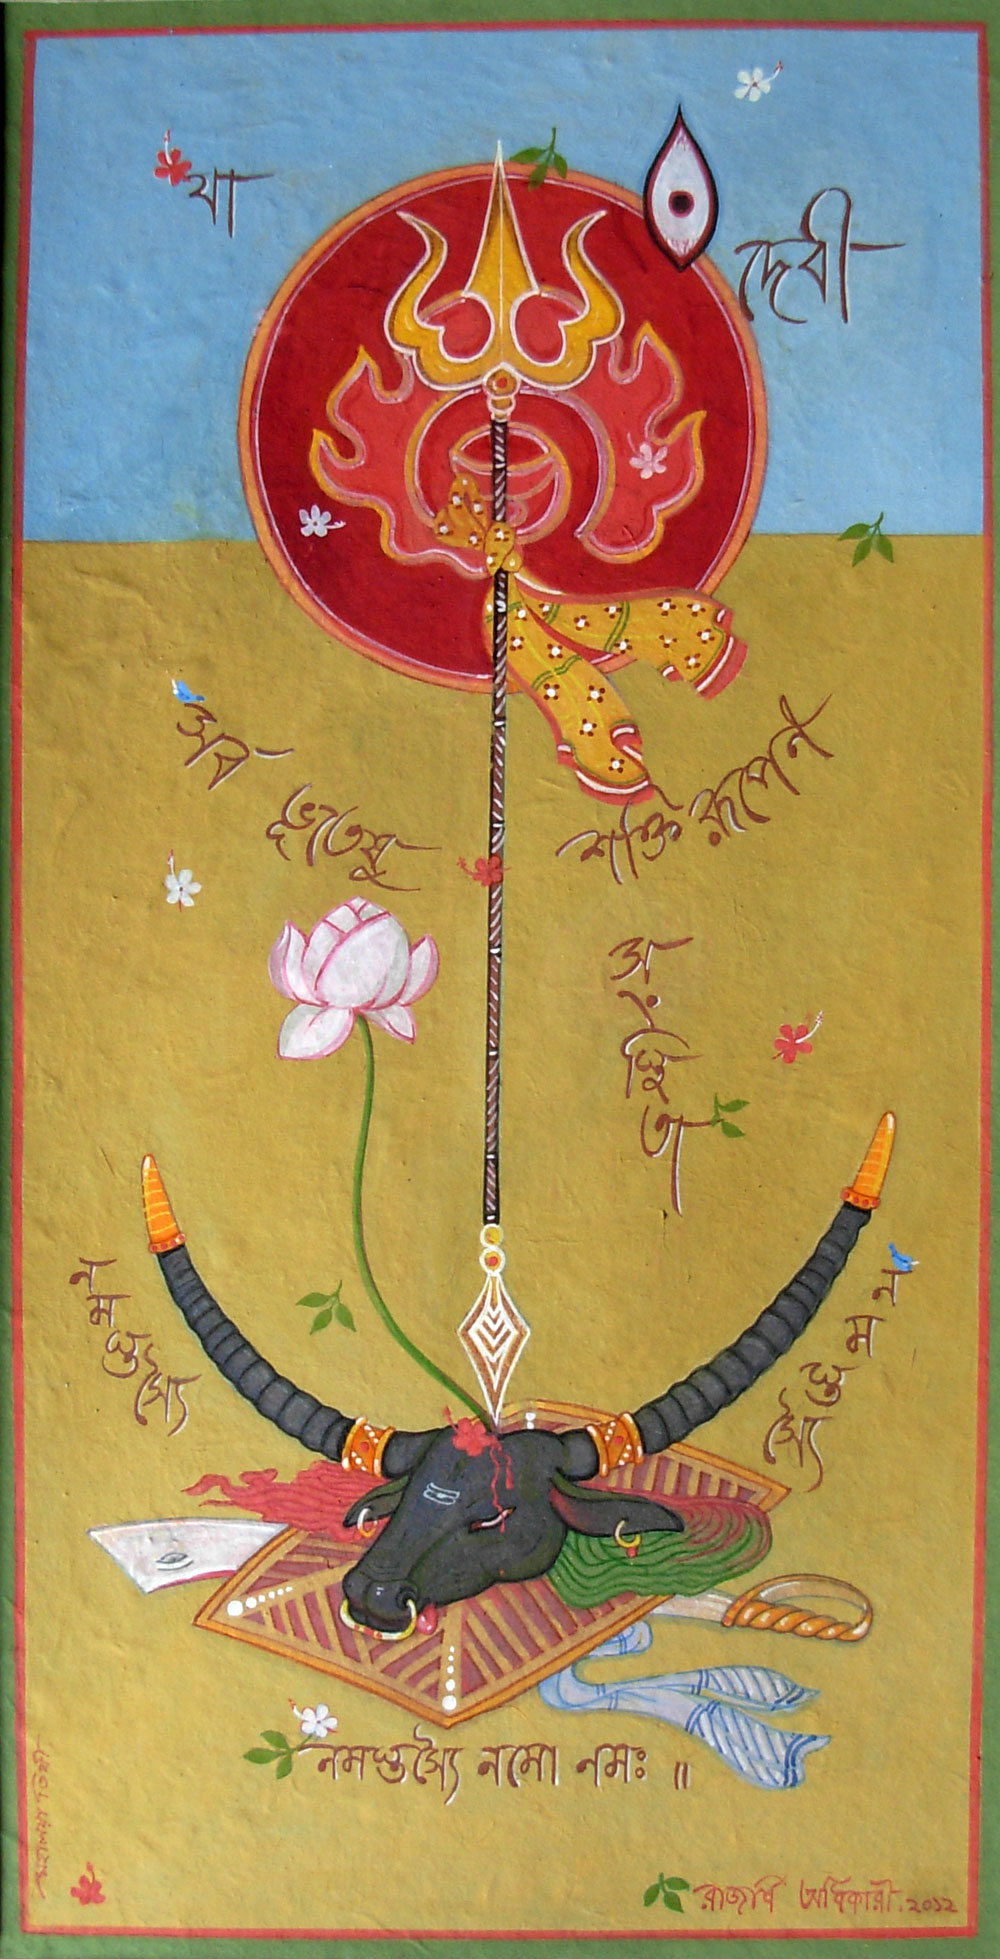 Mahishasur painting on paper